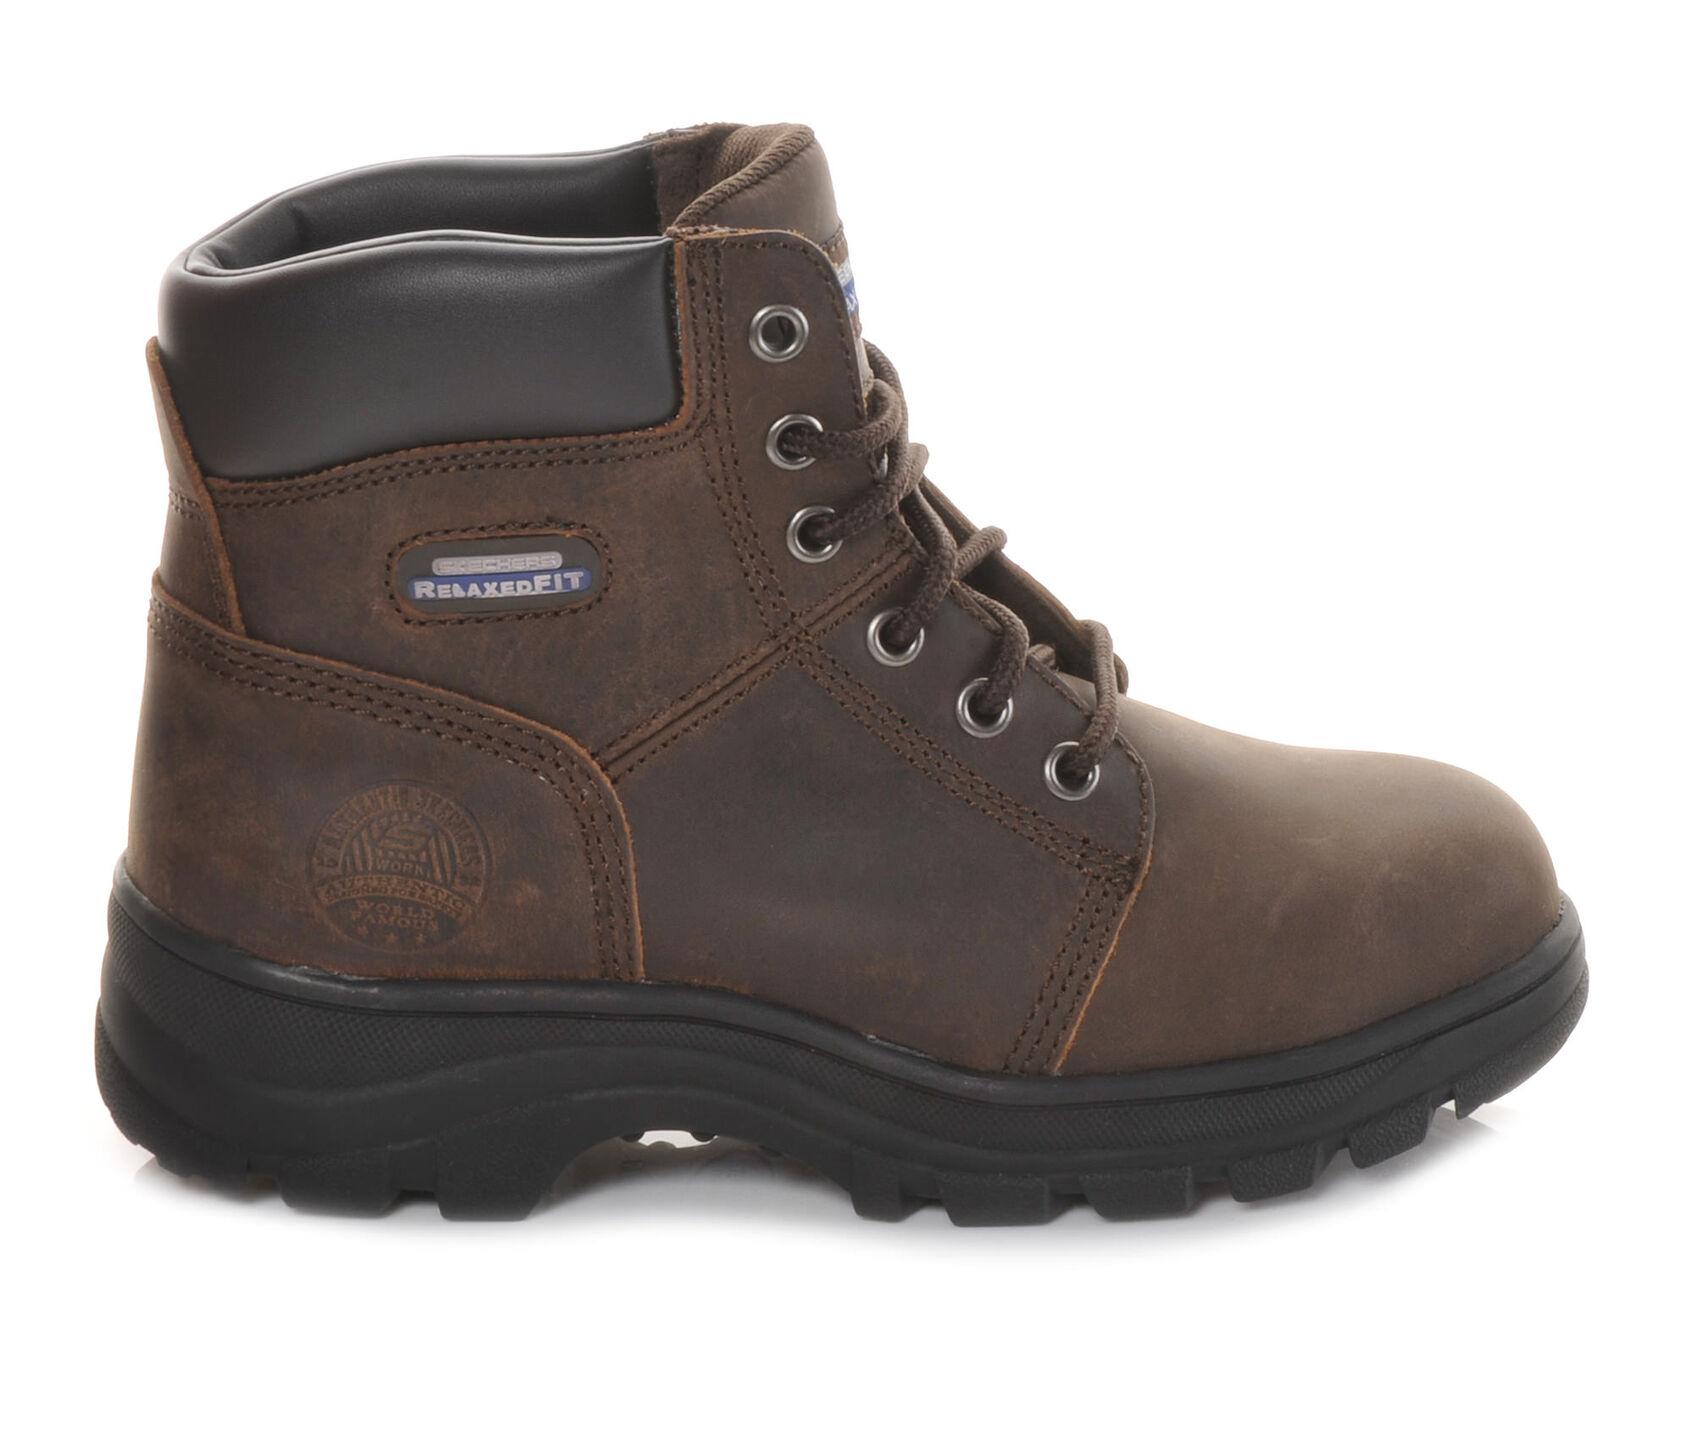 skechers work boots. images skechers work boots t